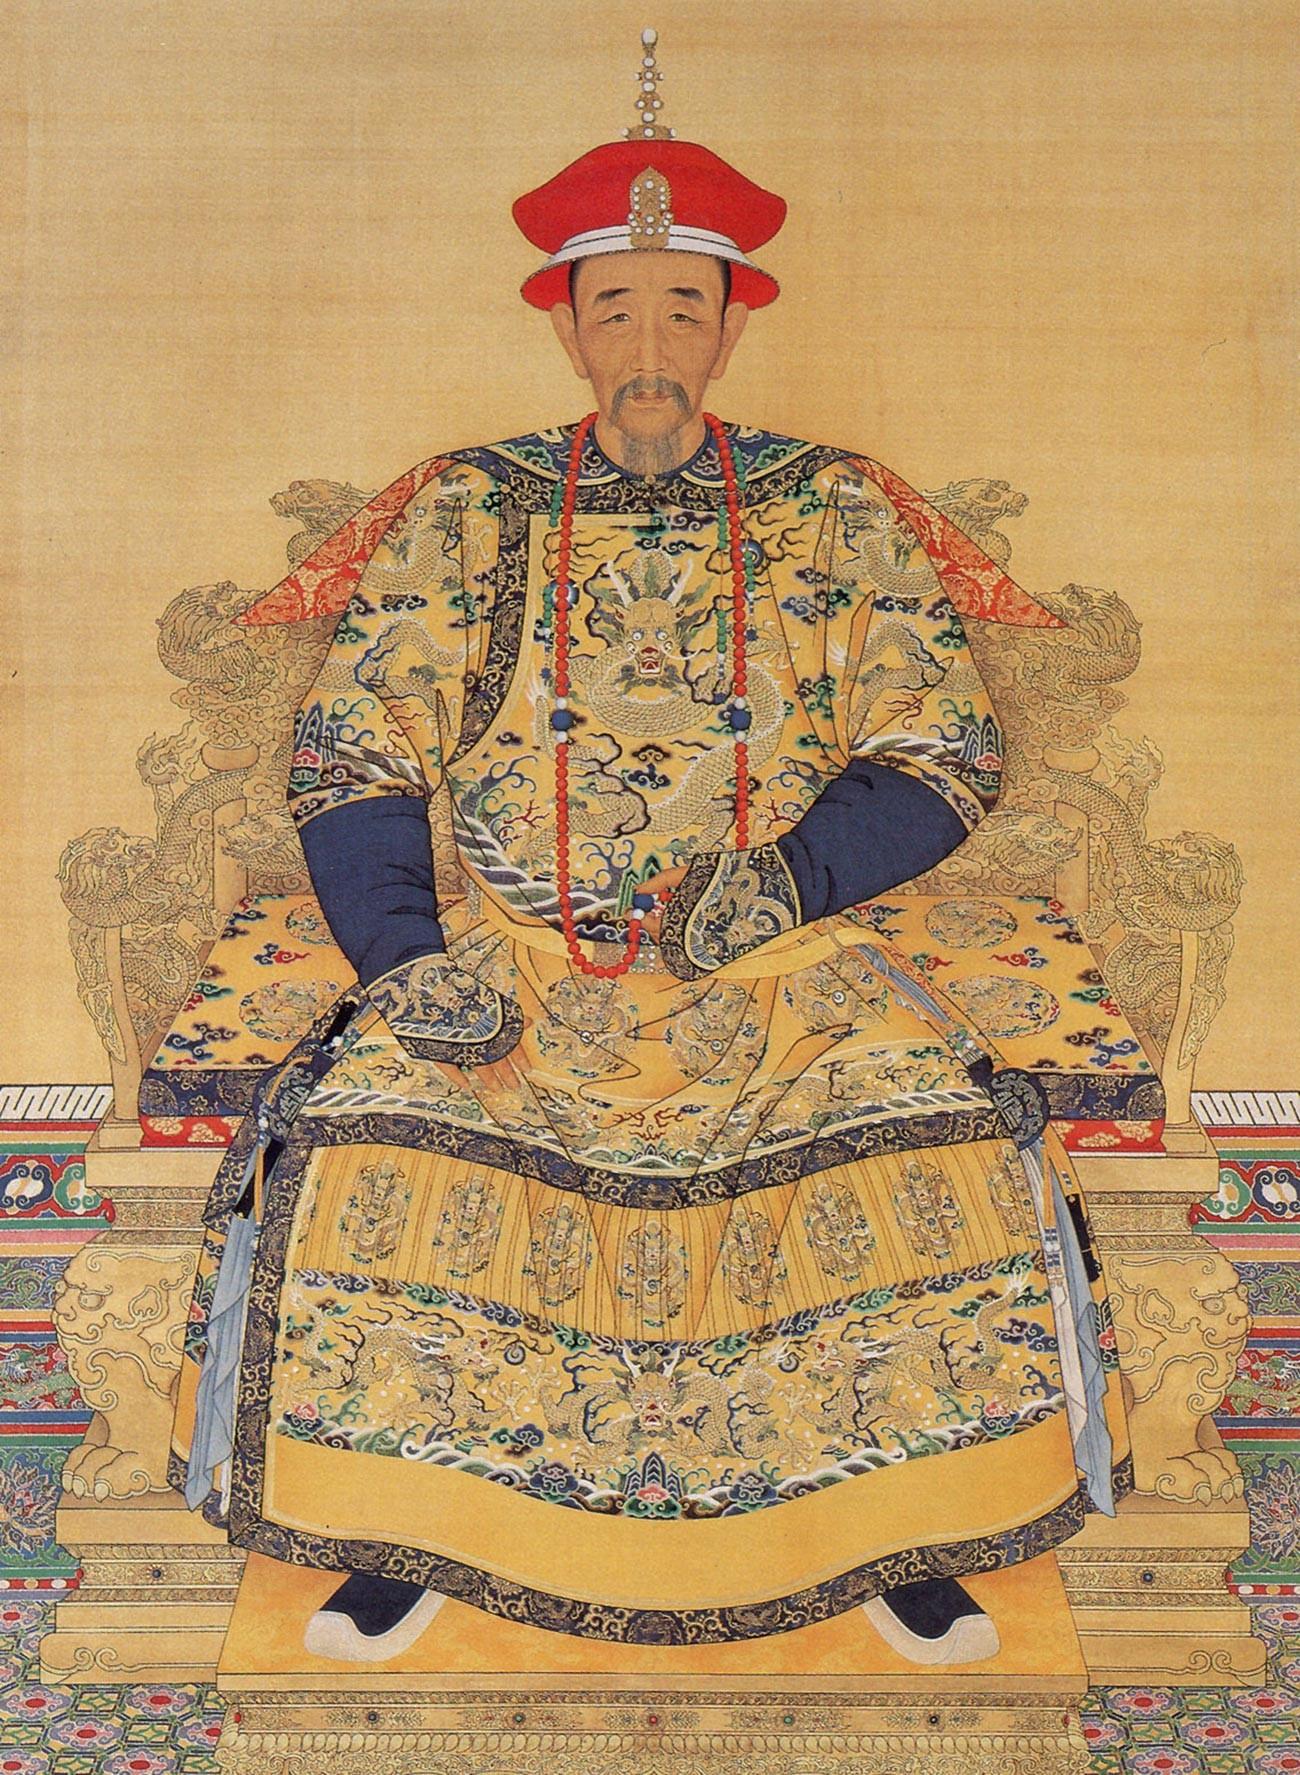 Маньчжурский император Айсиньгёро Сюанье.